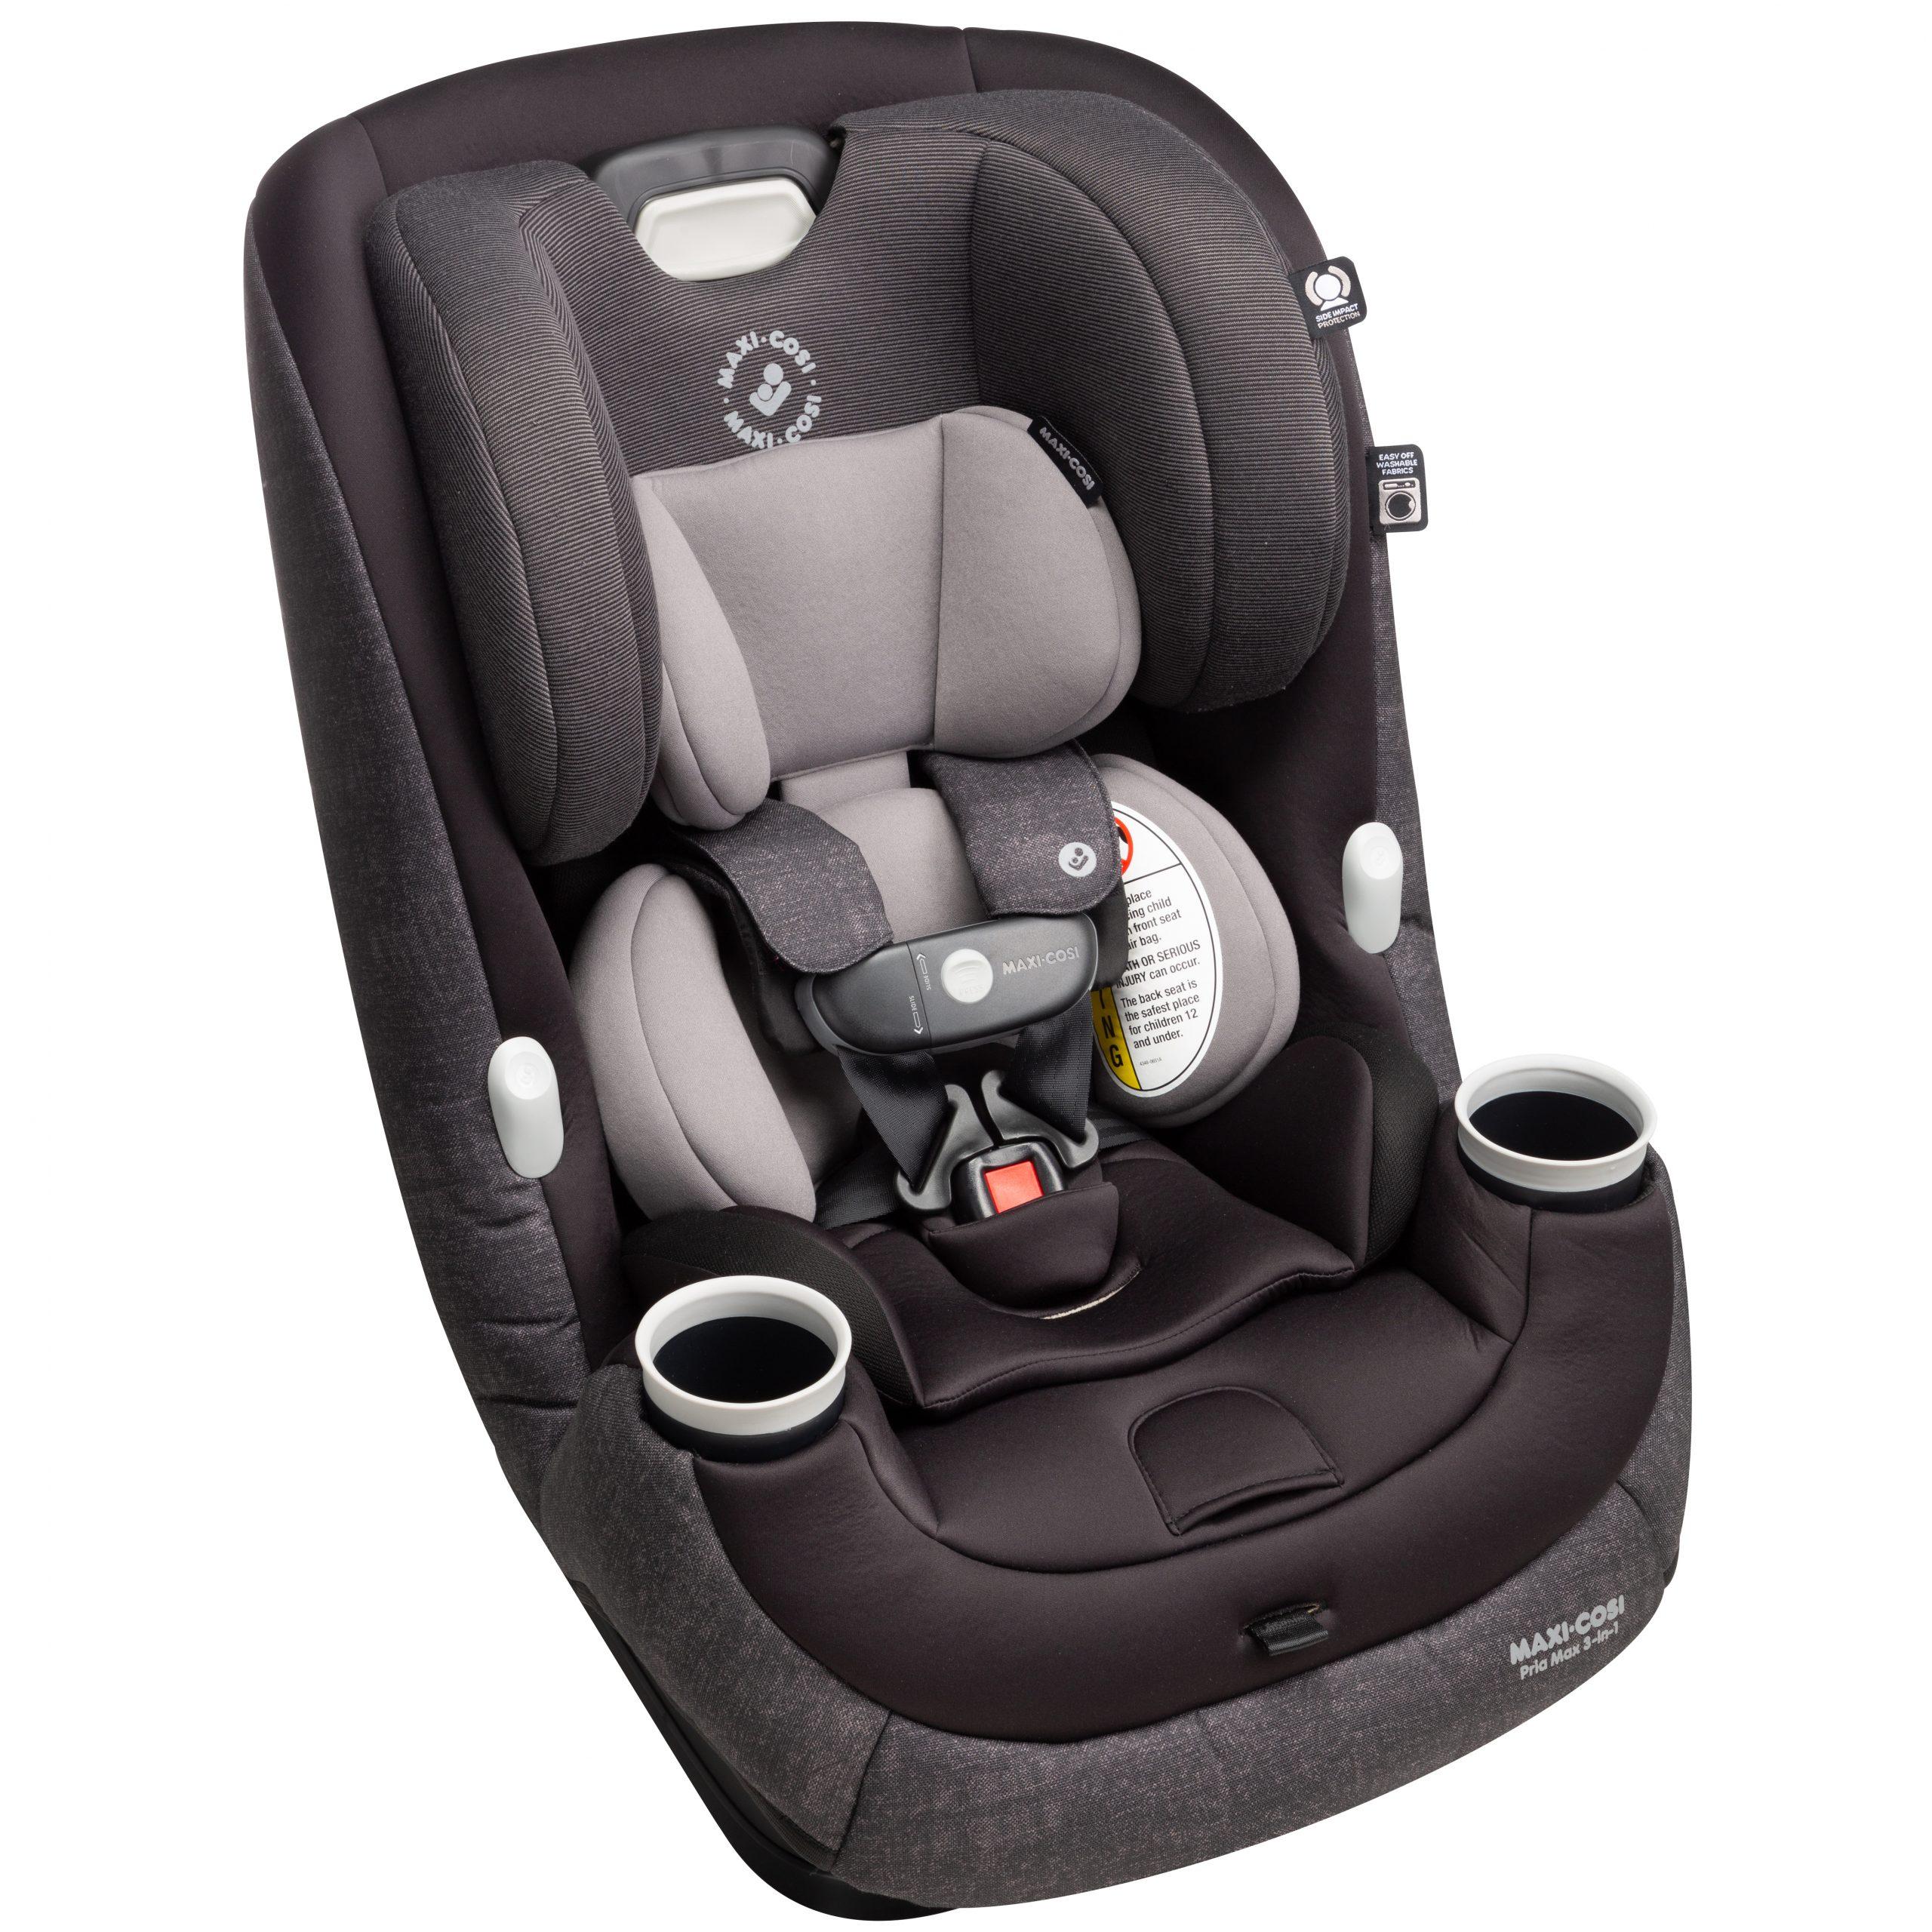 Pria Max 3-in-1 Convertible Car Seat